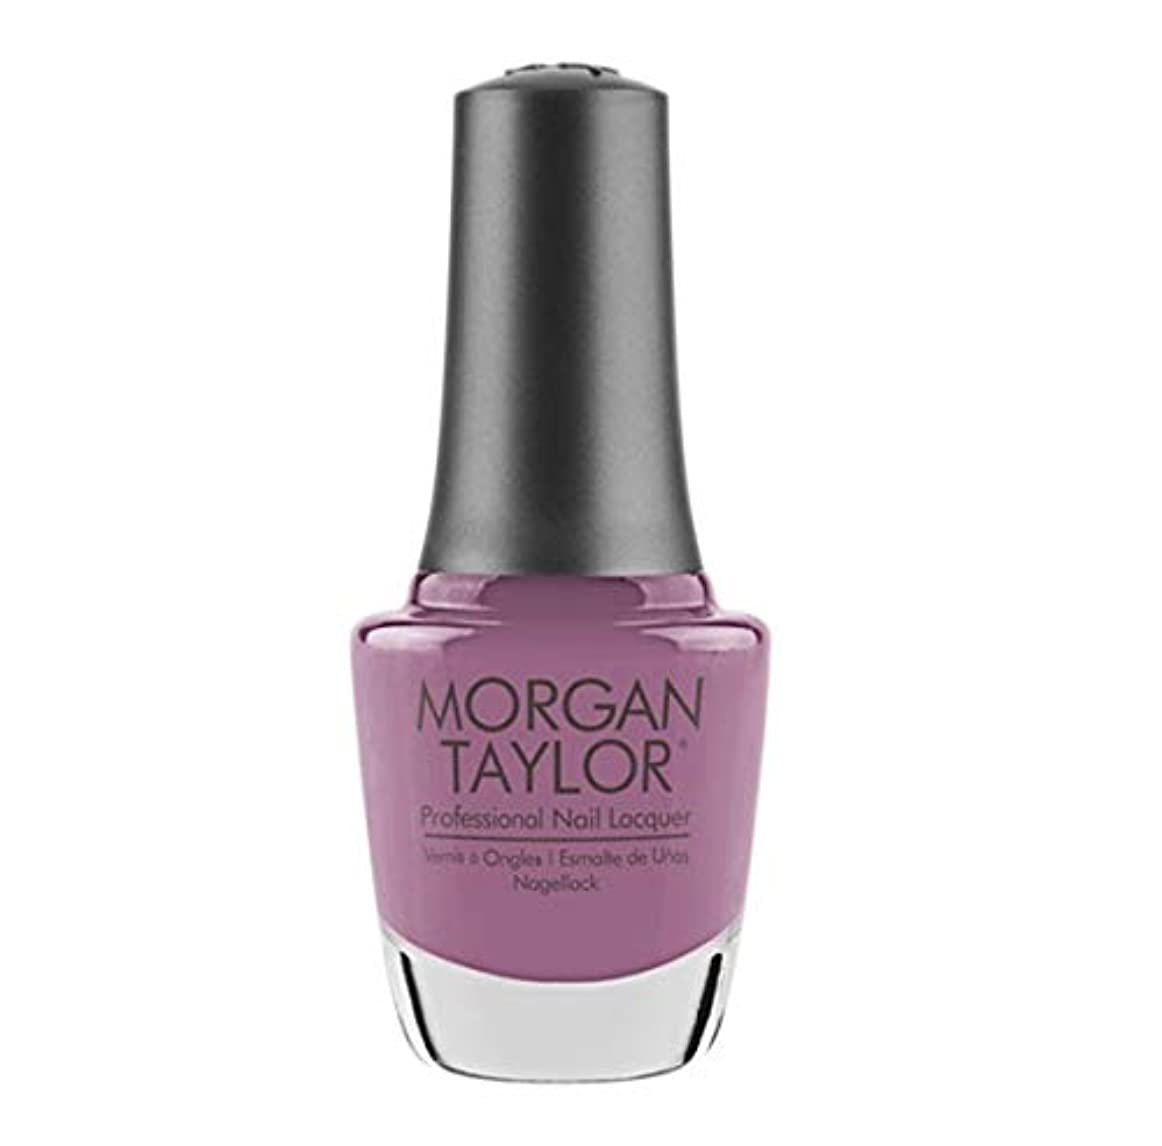 Morgan Taylor Nail Lacquer - Merci Bouquet - 15 ml / 0.5 oz